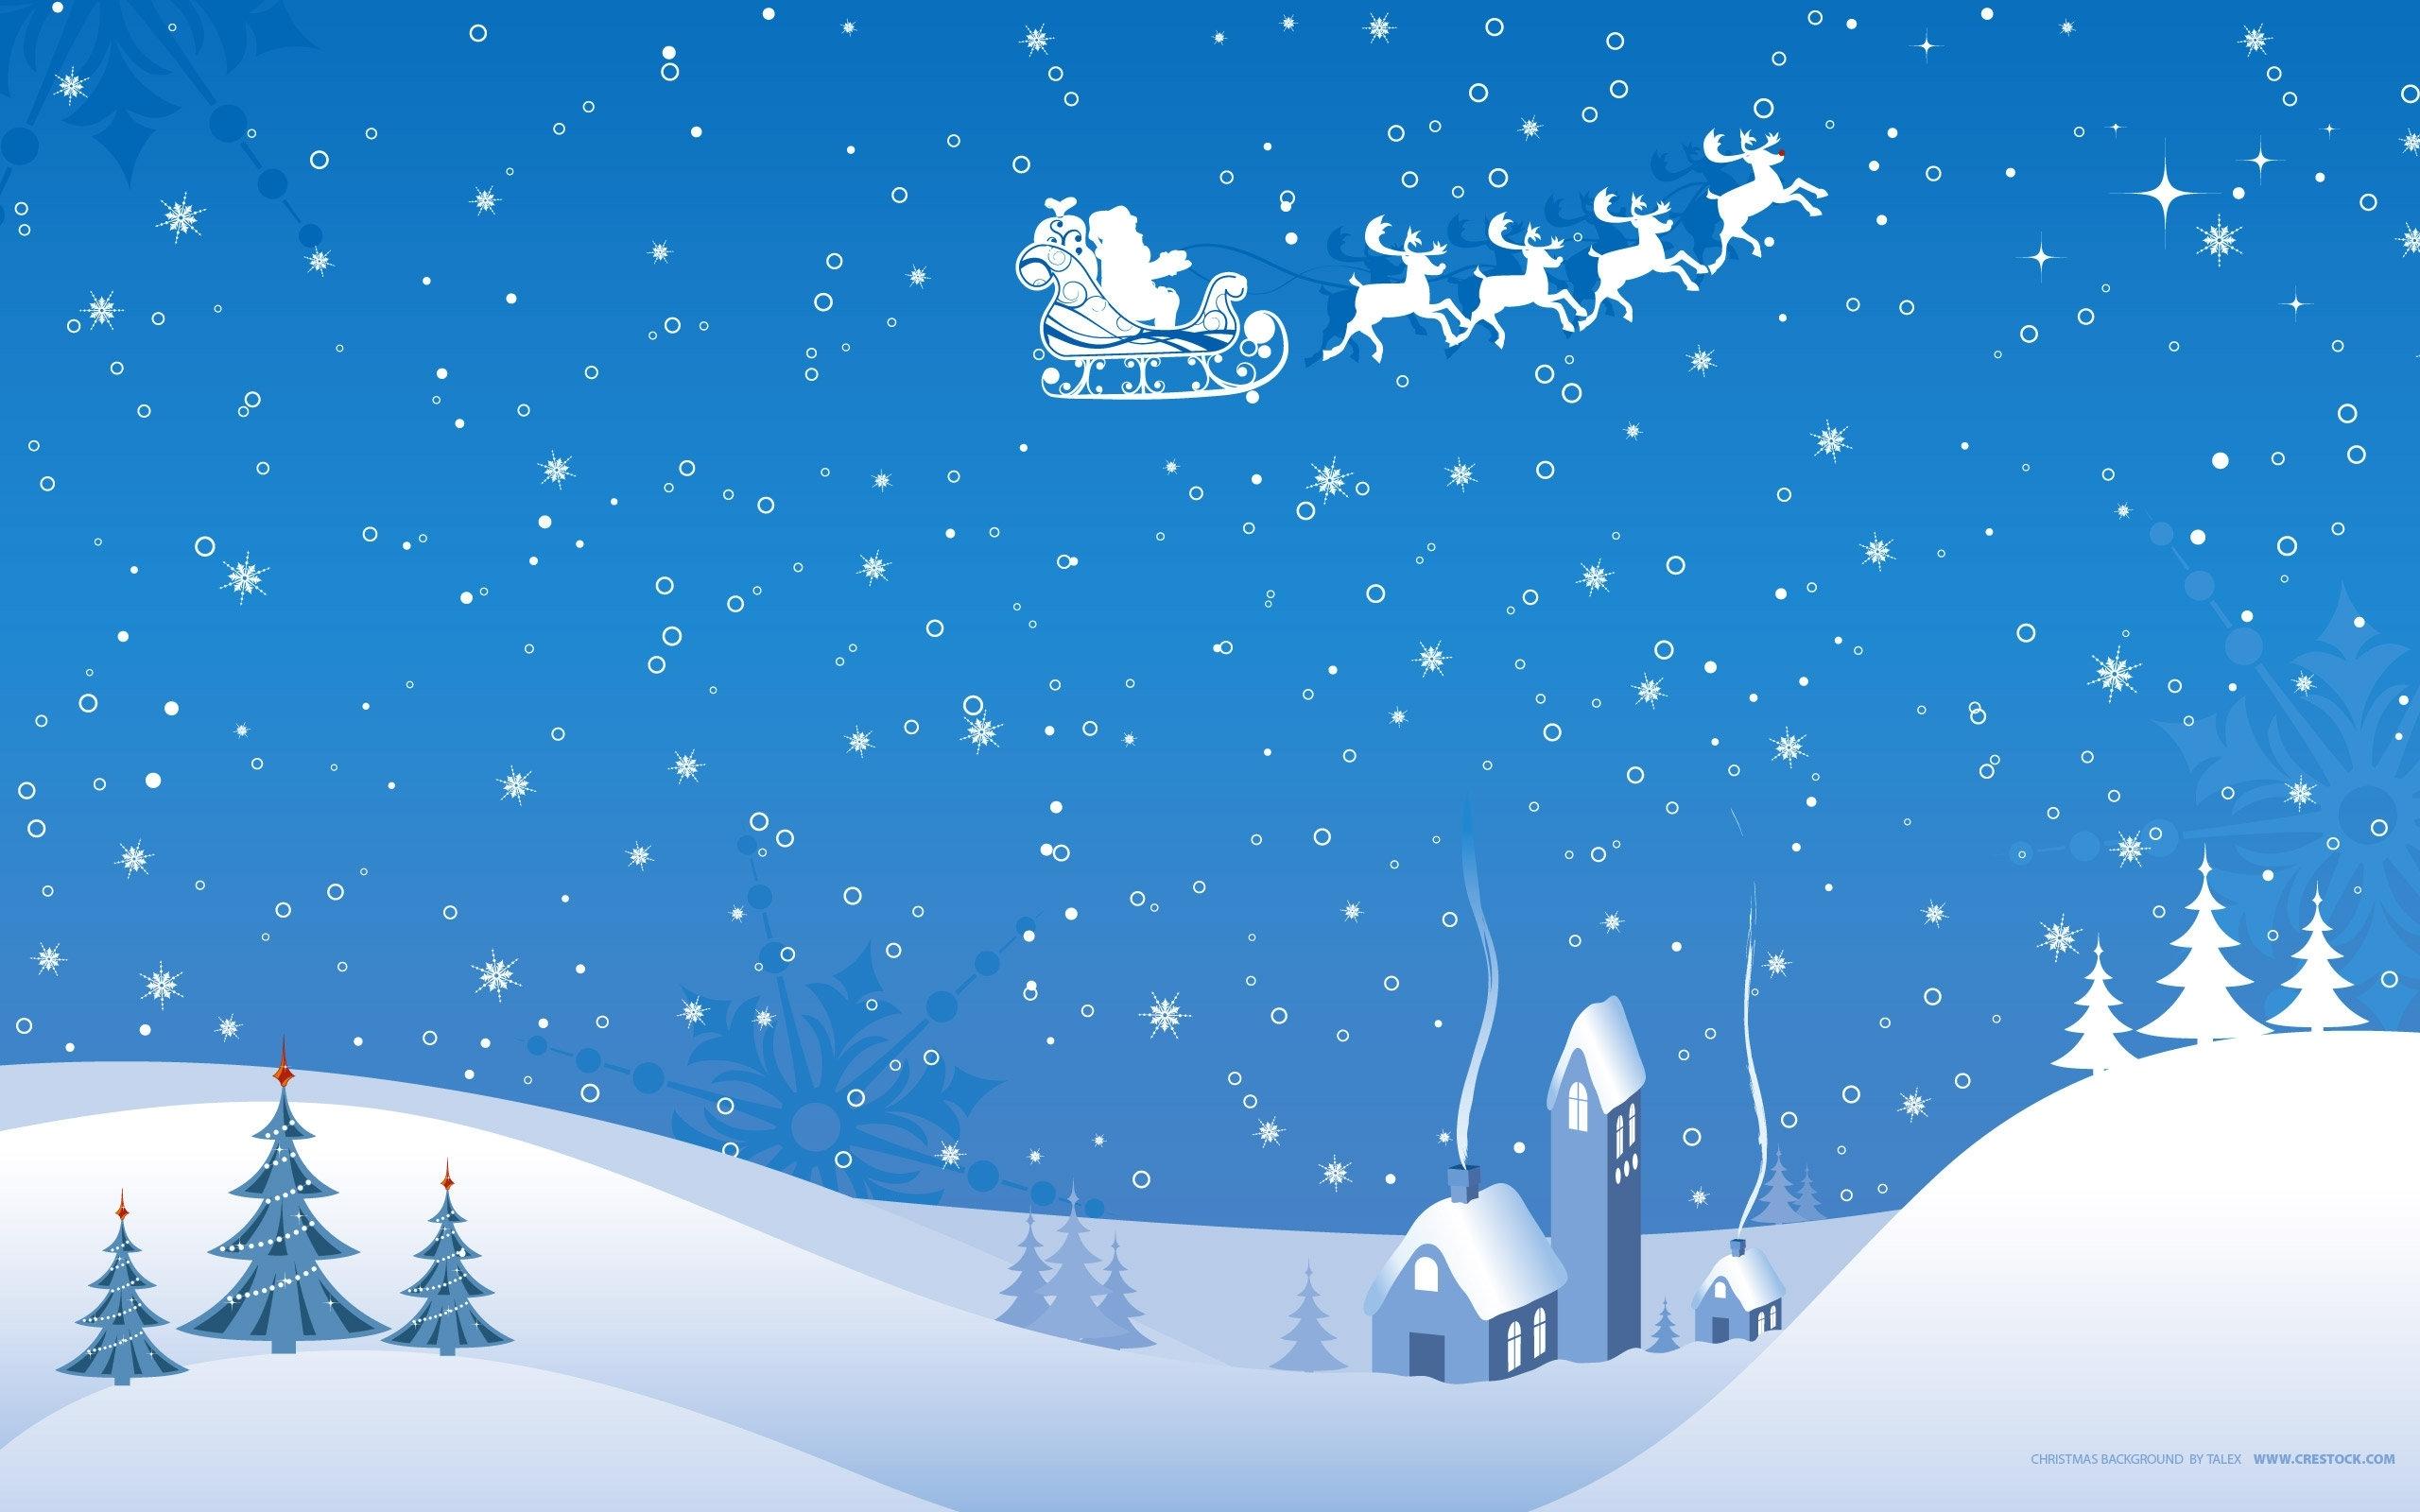 christmas snow scene wallpaper | 2560x1600 | 1208 | wallpaperup